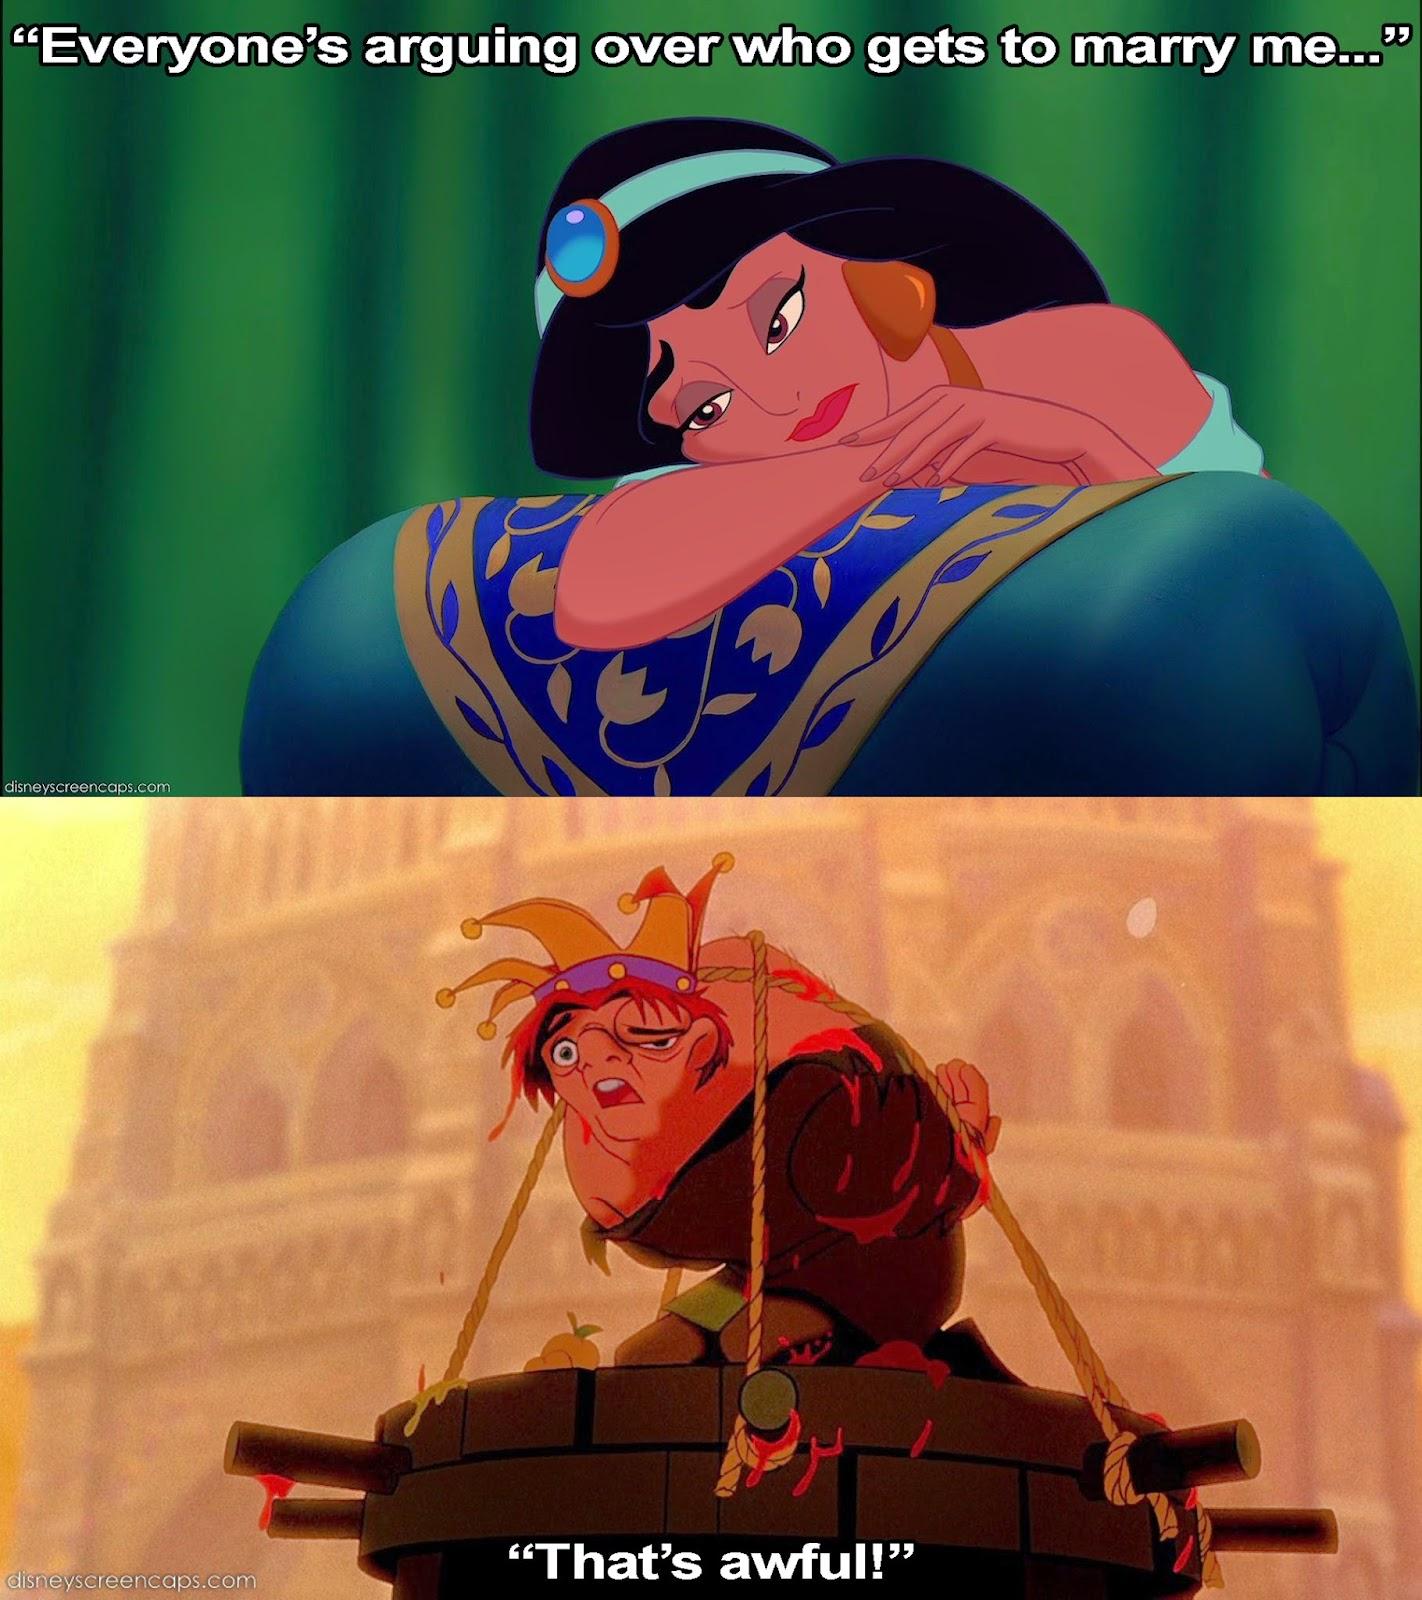 Funny Disney Memes Clean : Disney memes